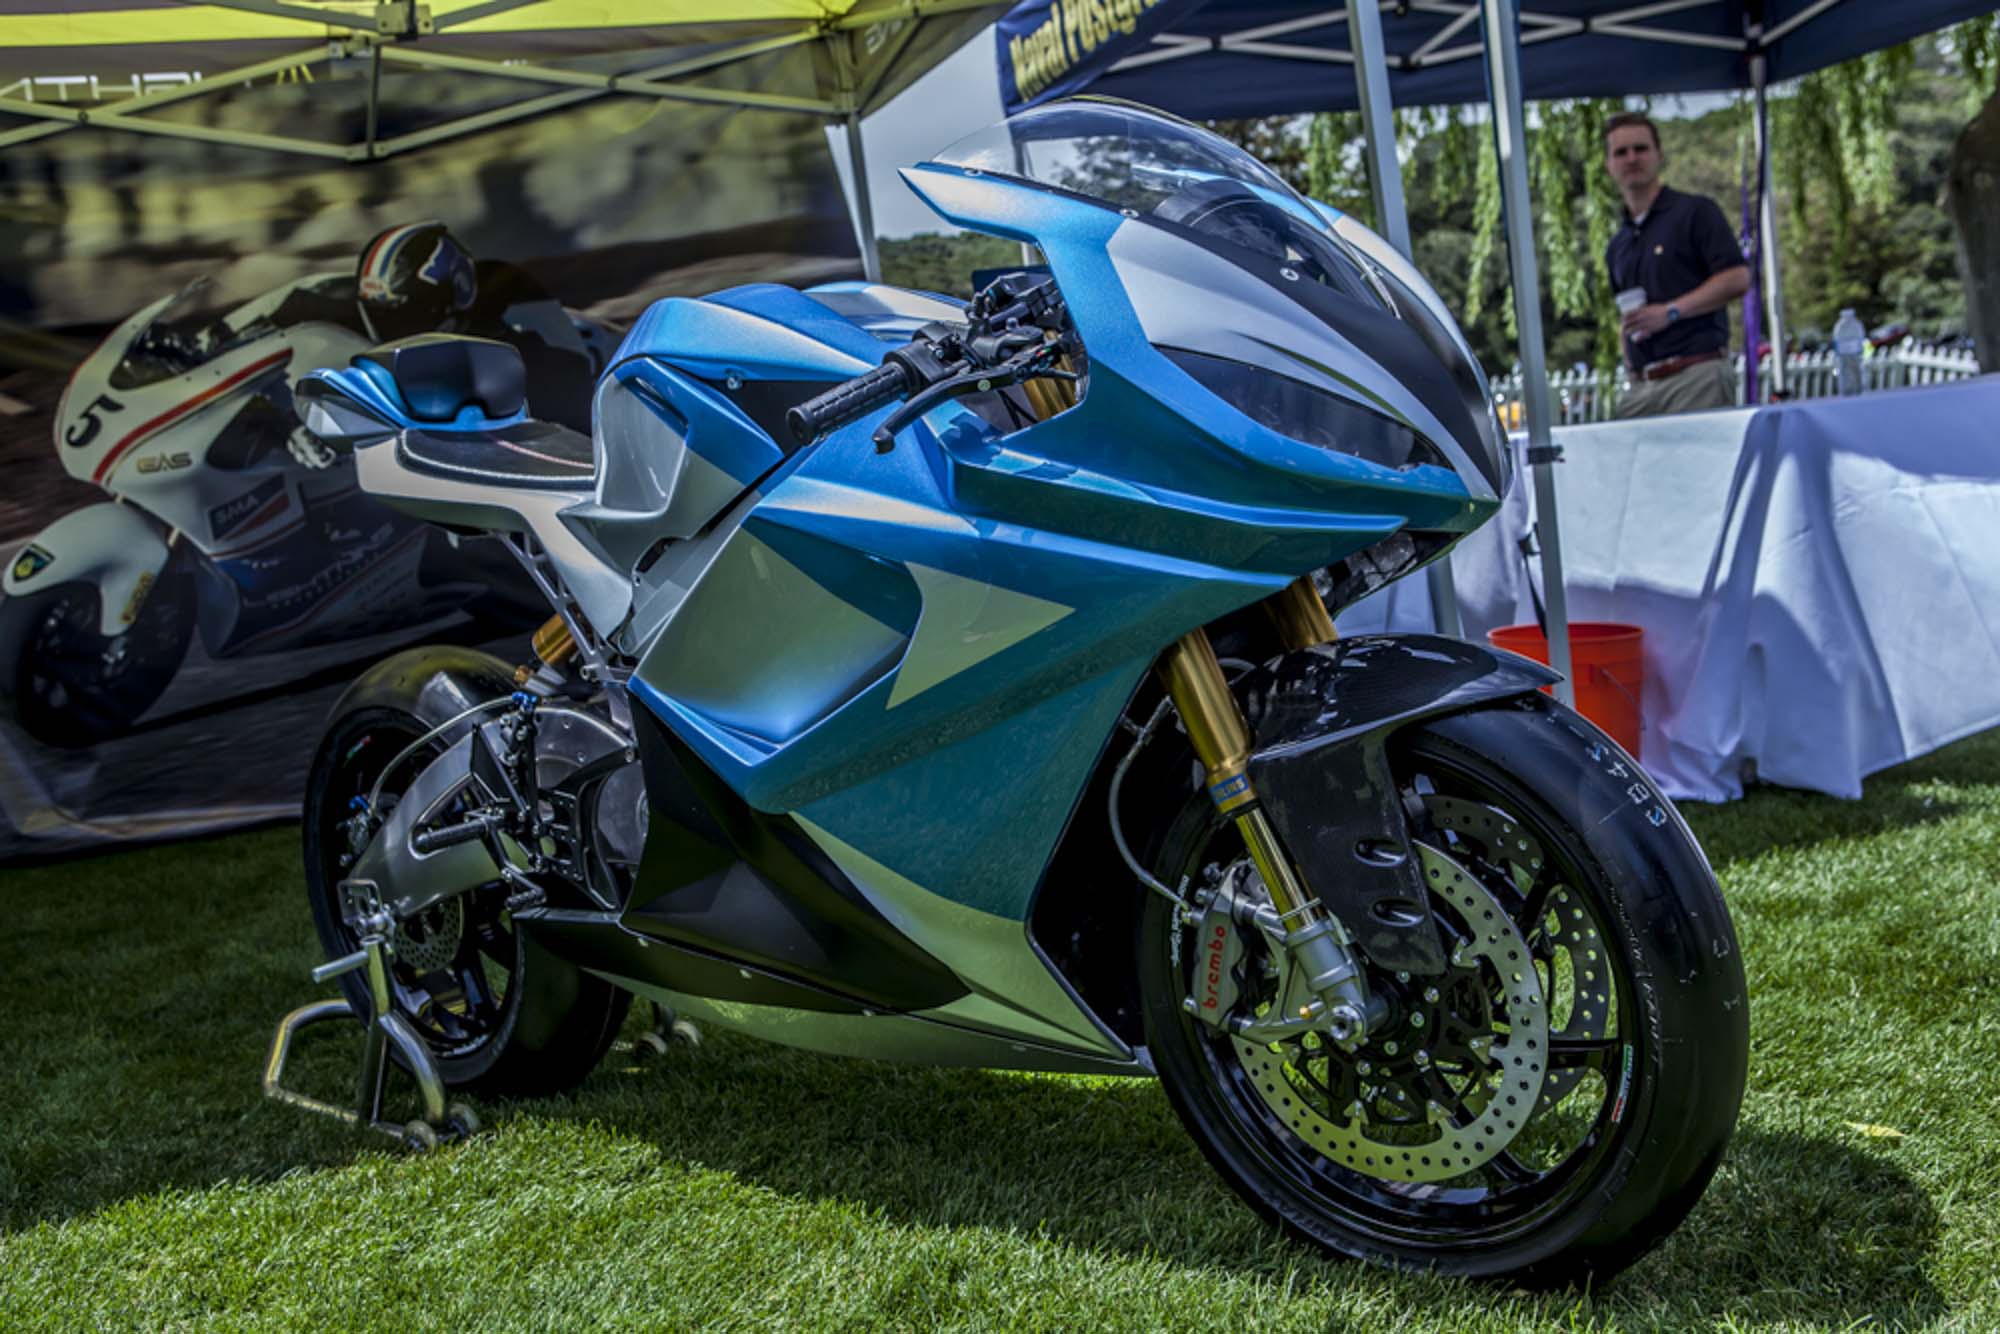 La sportive verte du futur - Page 15 Lightning-Motorcycles-LS-218-Quail-Lodge-Bryan-Delohery-04